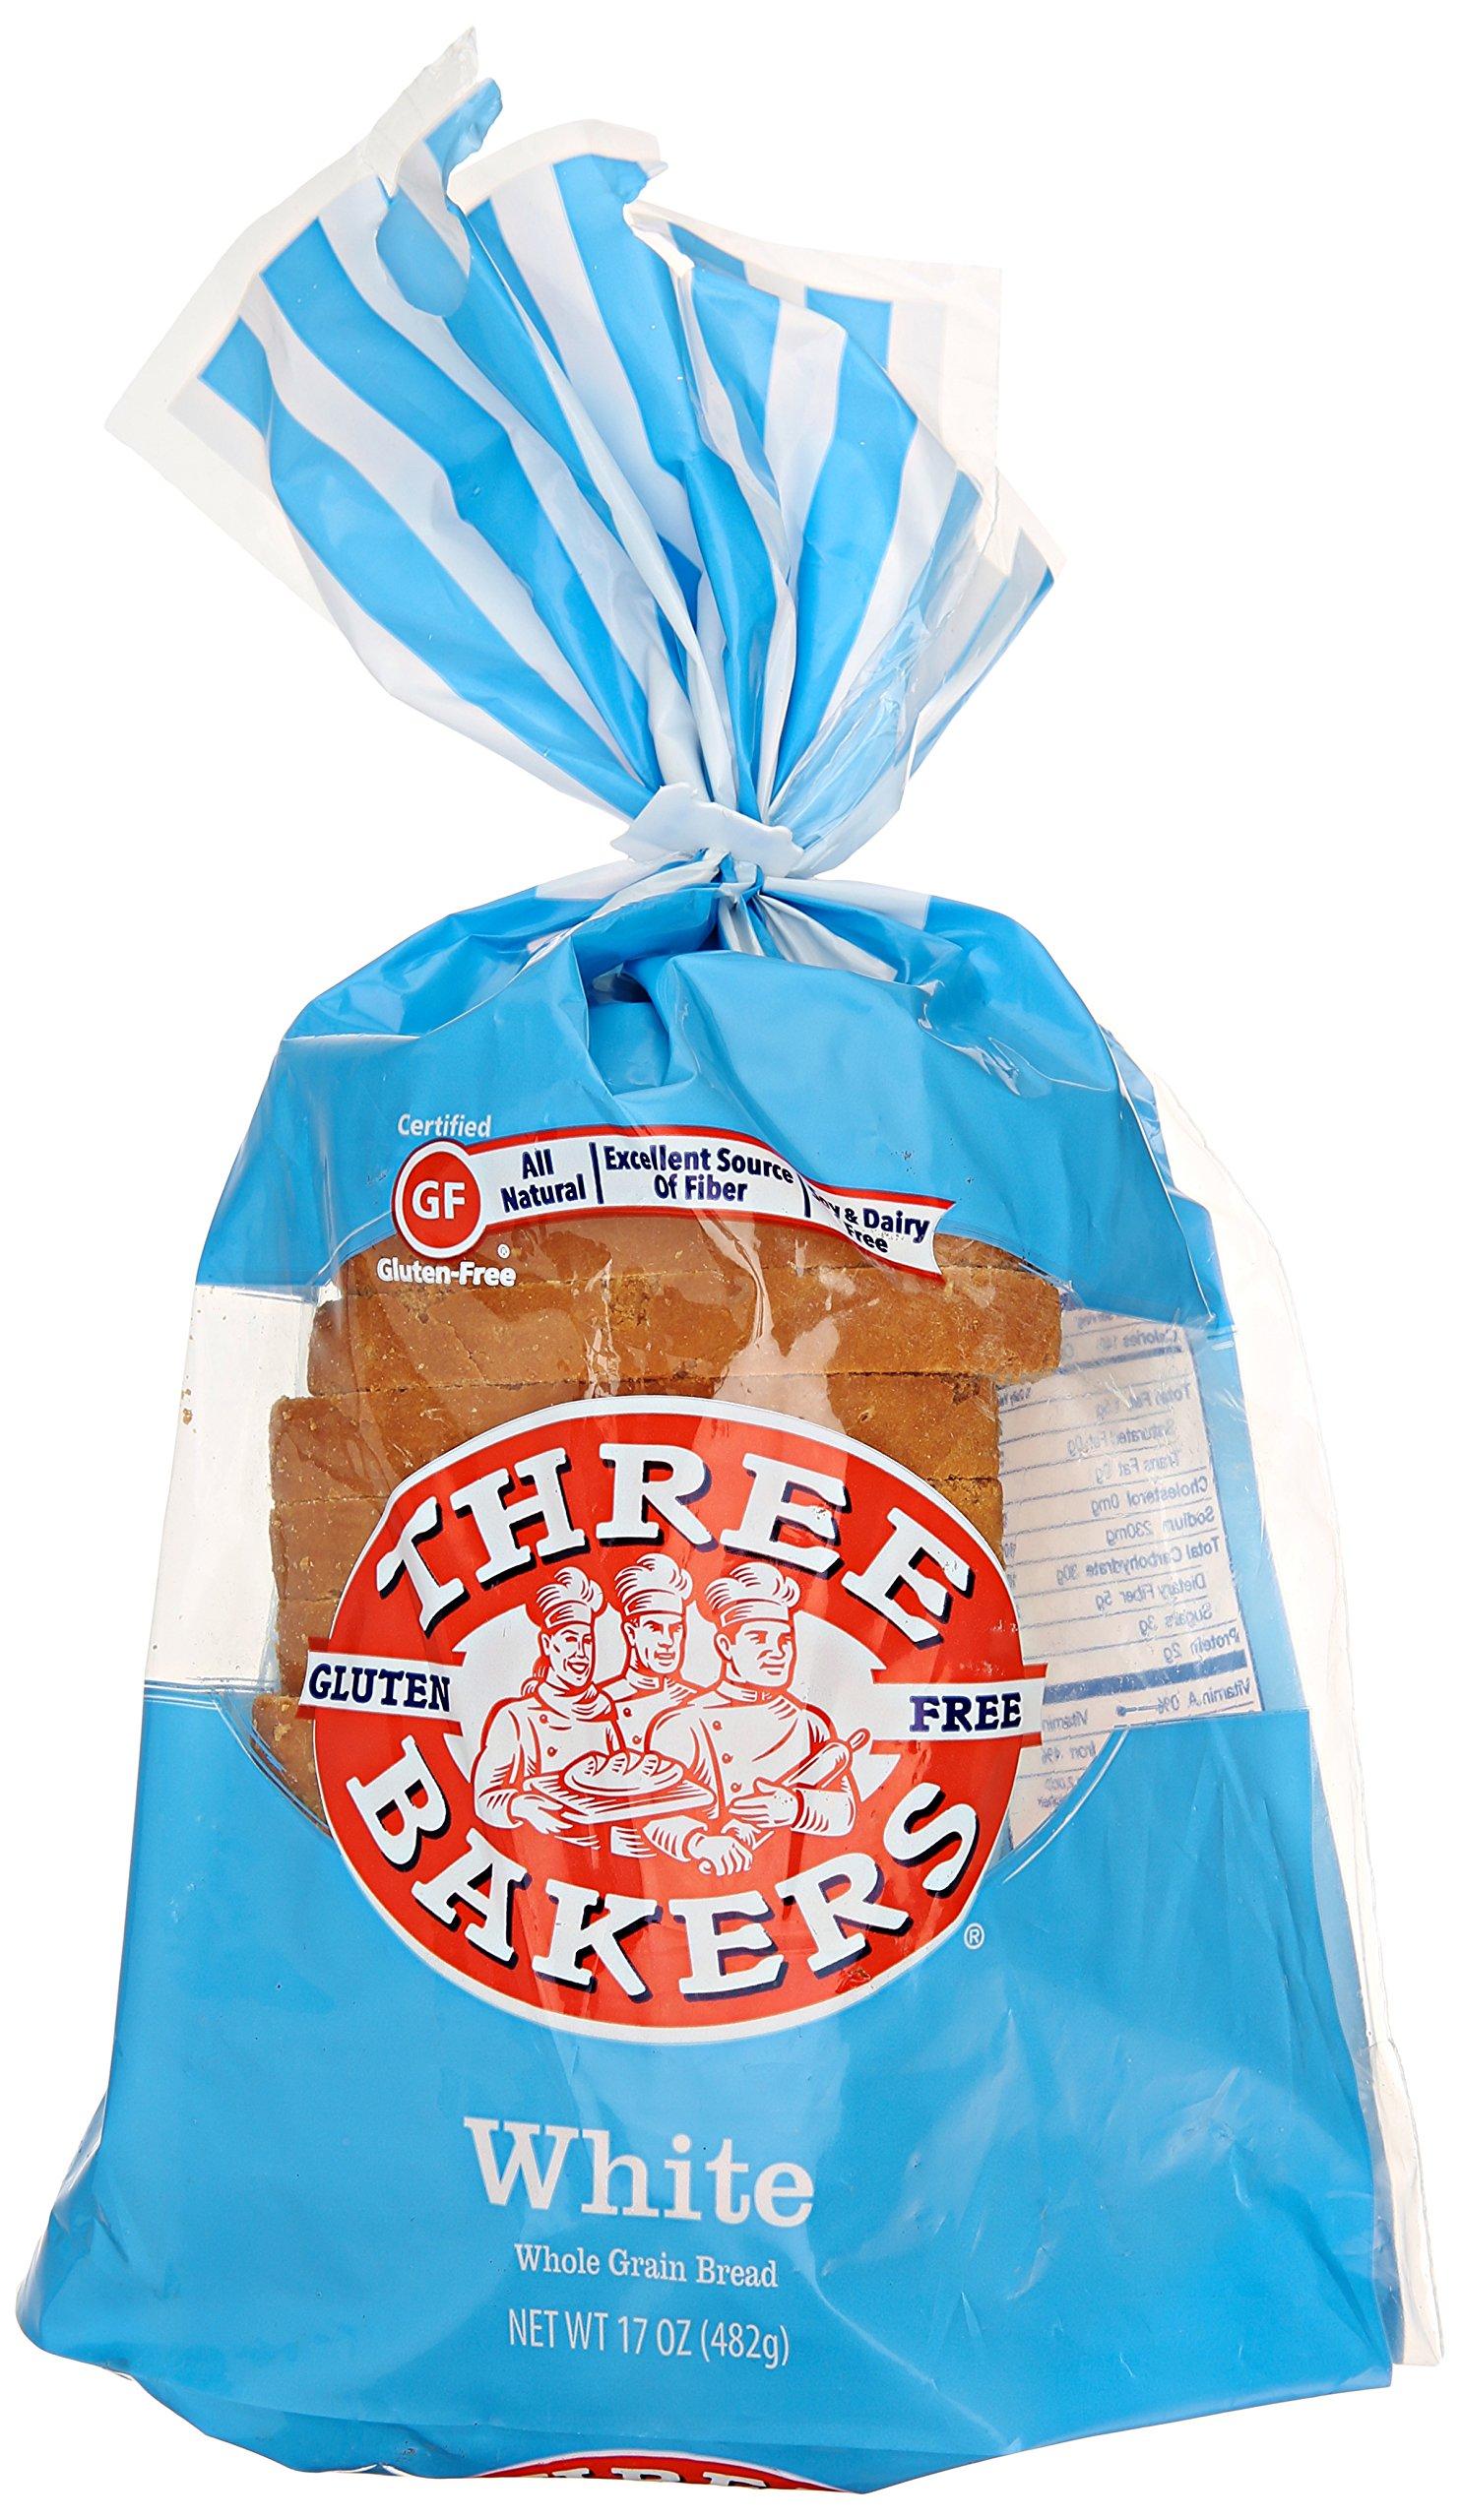 Three Bakers, Sliced Bread, White Whole Grain, 17 oz (frozen)